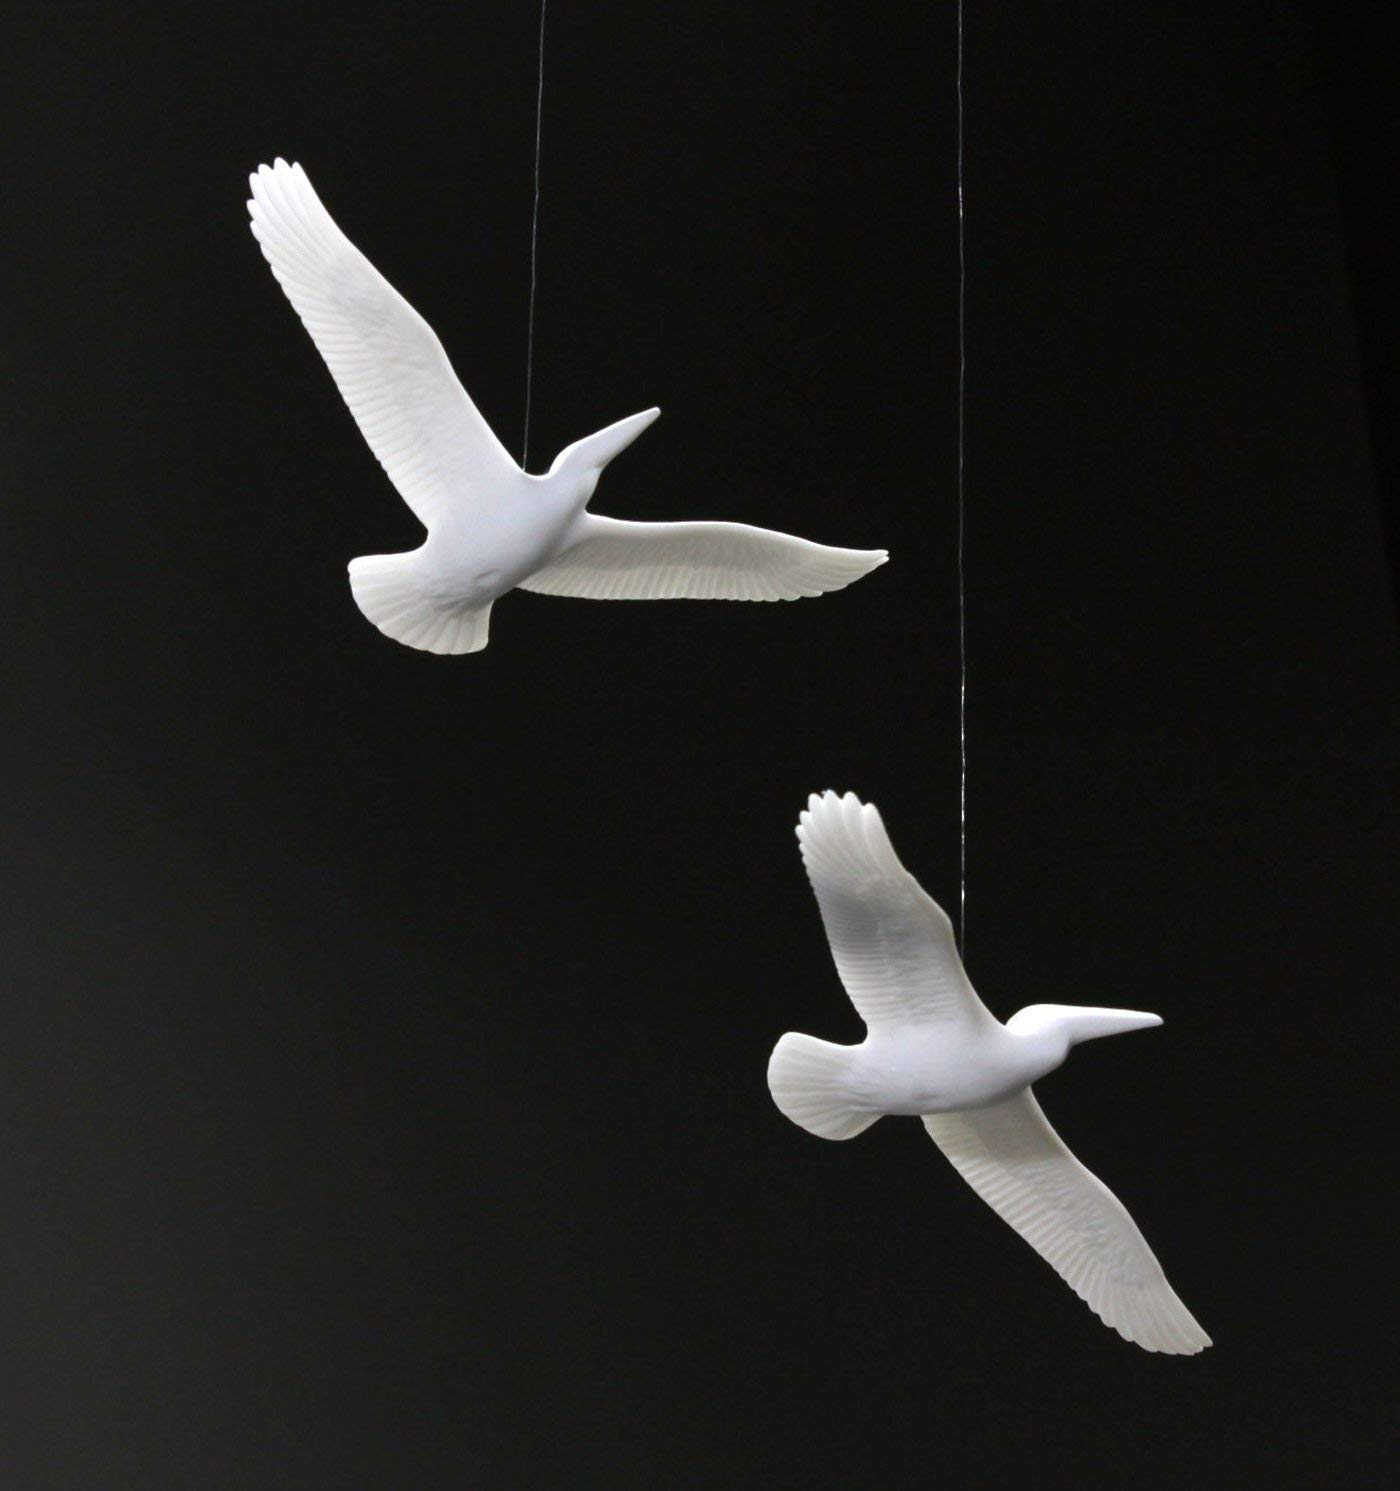 PELICAN DUO MOBILE Sculpture by JOHN PERRY 6in wingspan Sculpture Art Pellucida